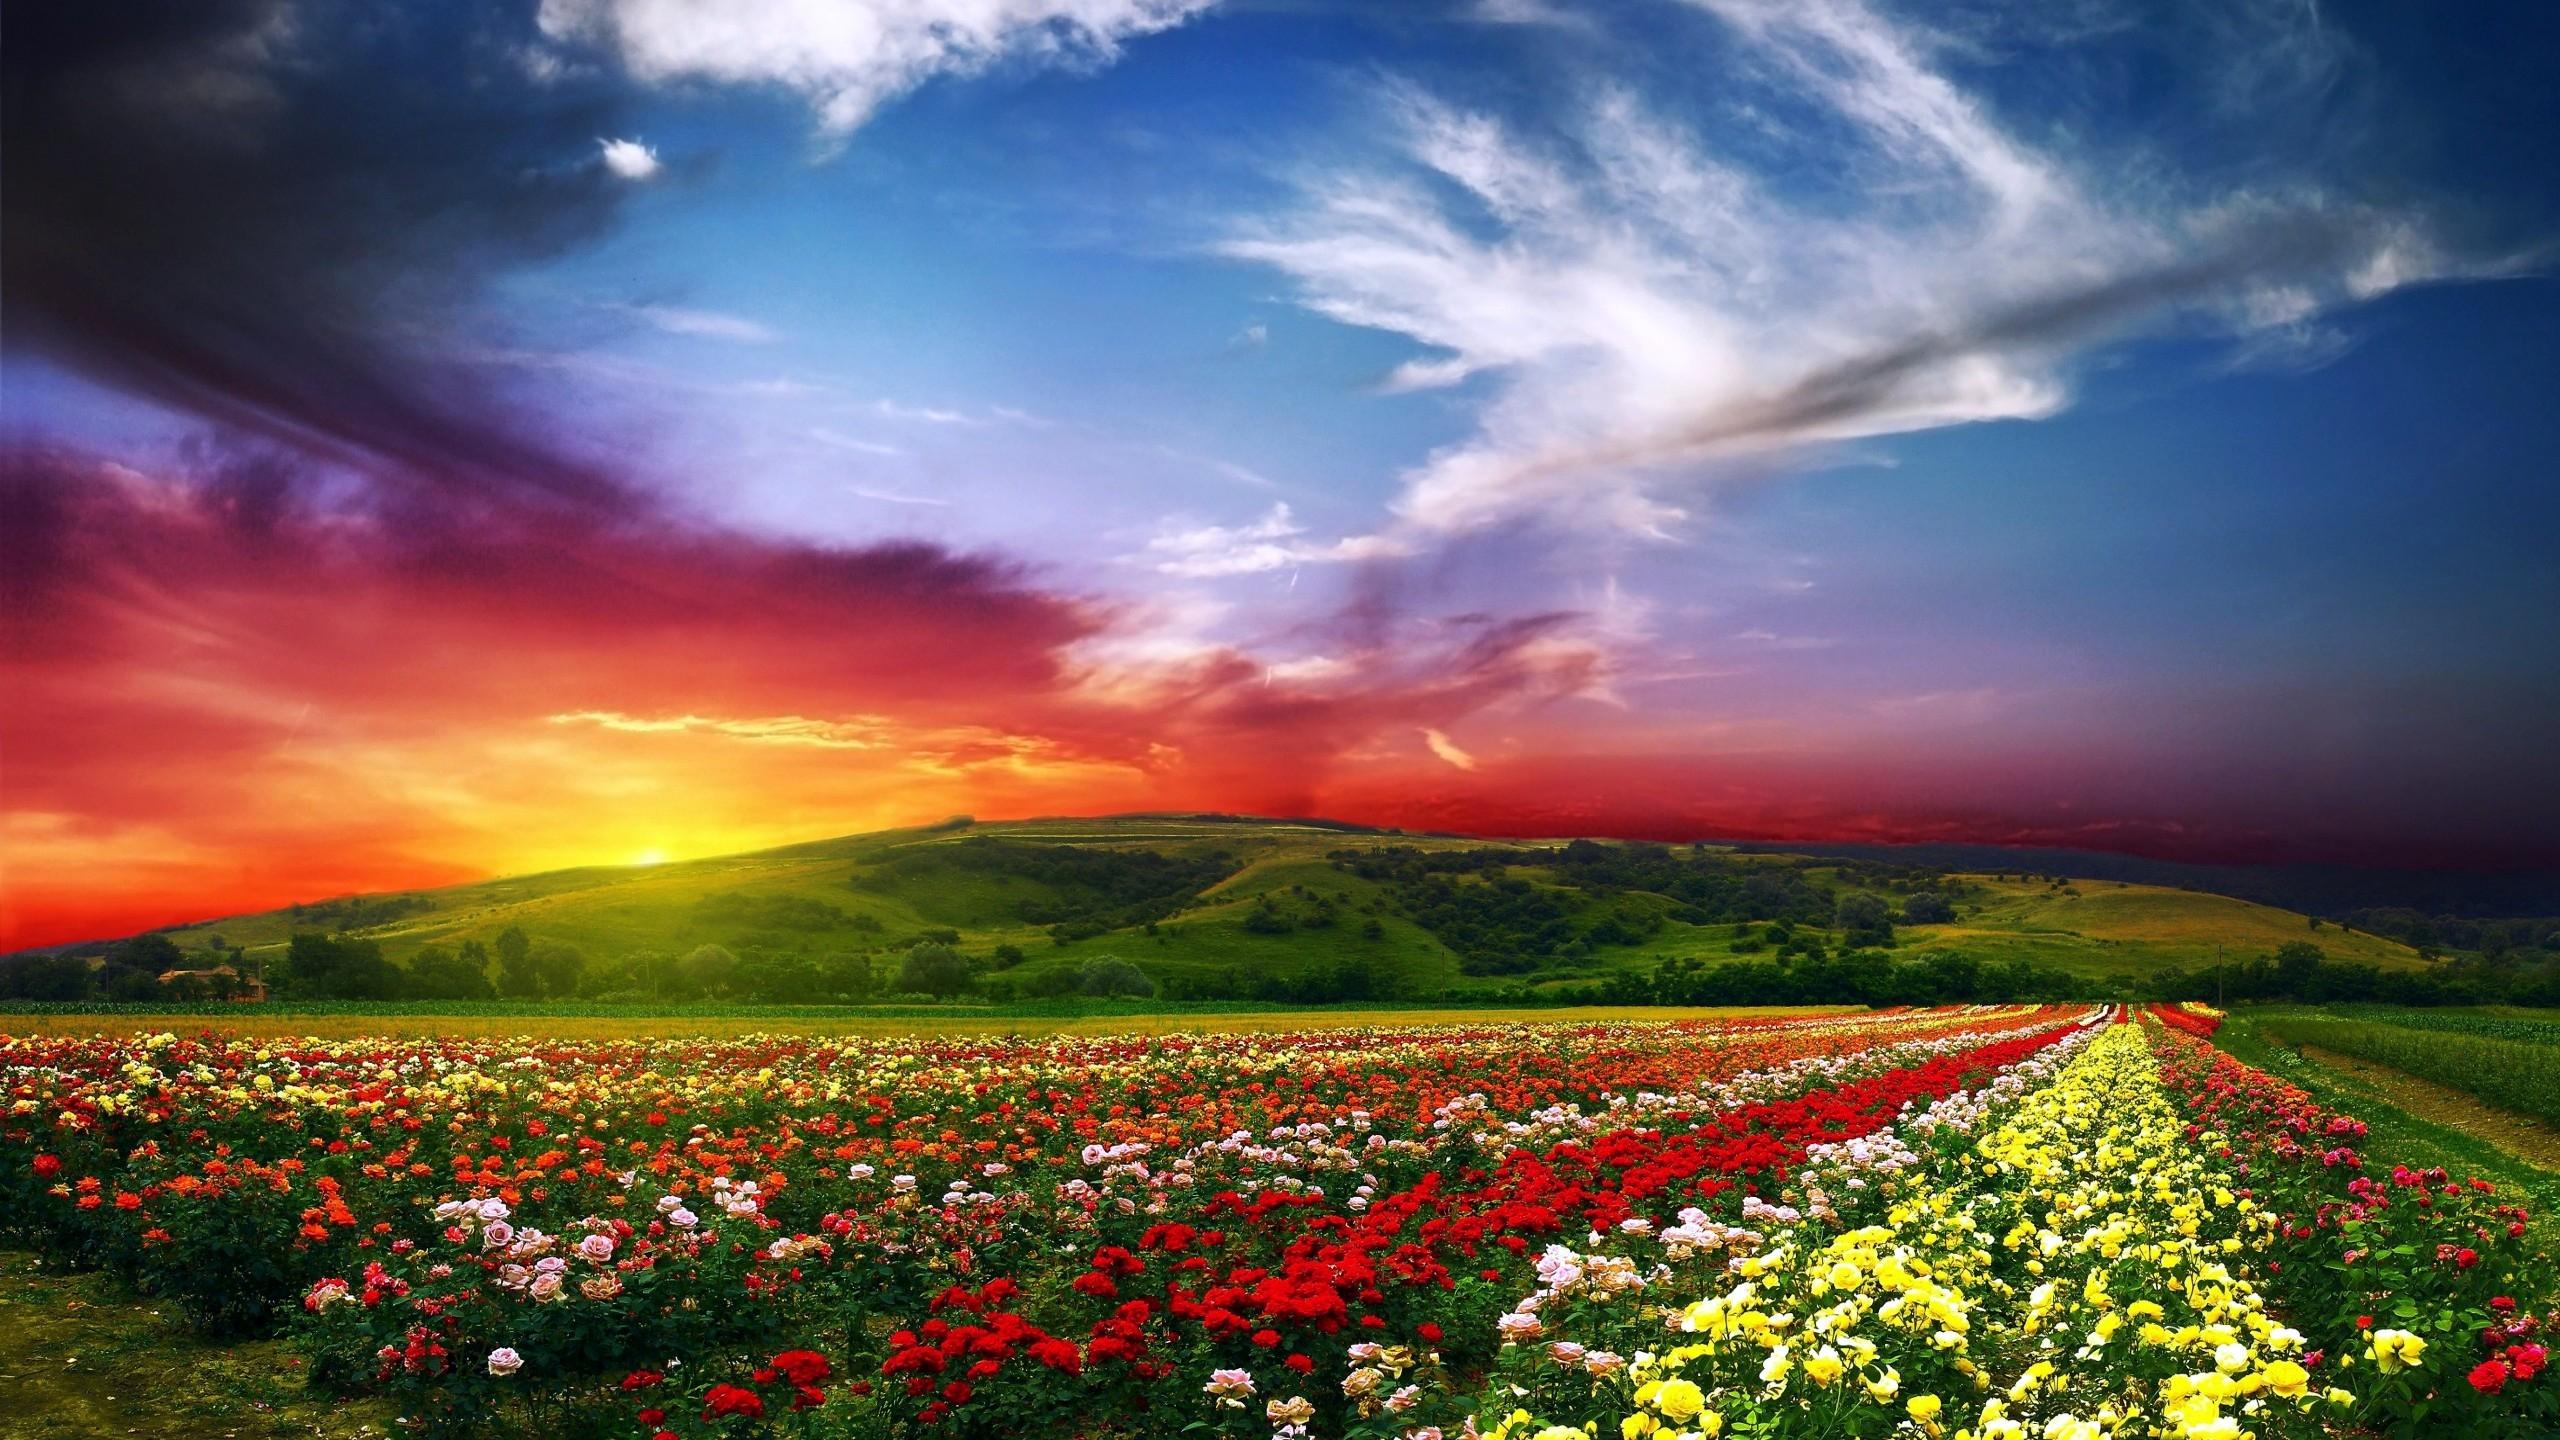 Paradise Wallpaper Hd 244437 2560x1440